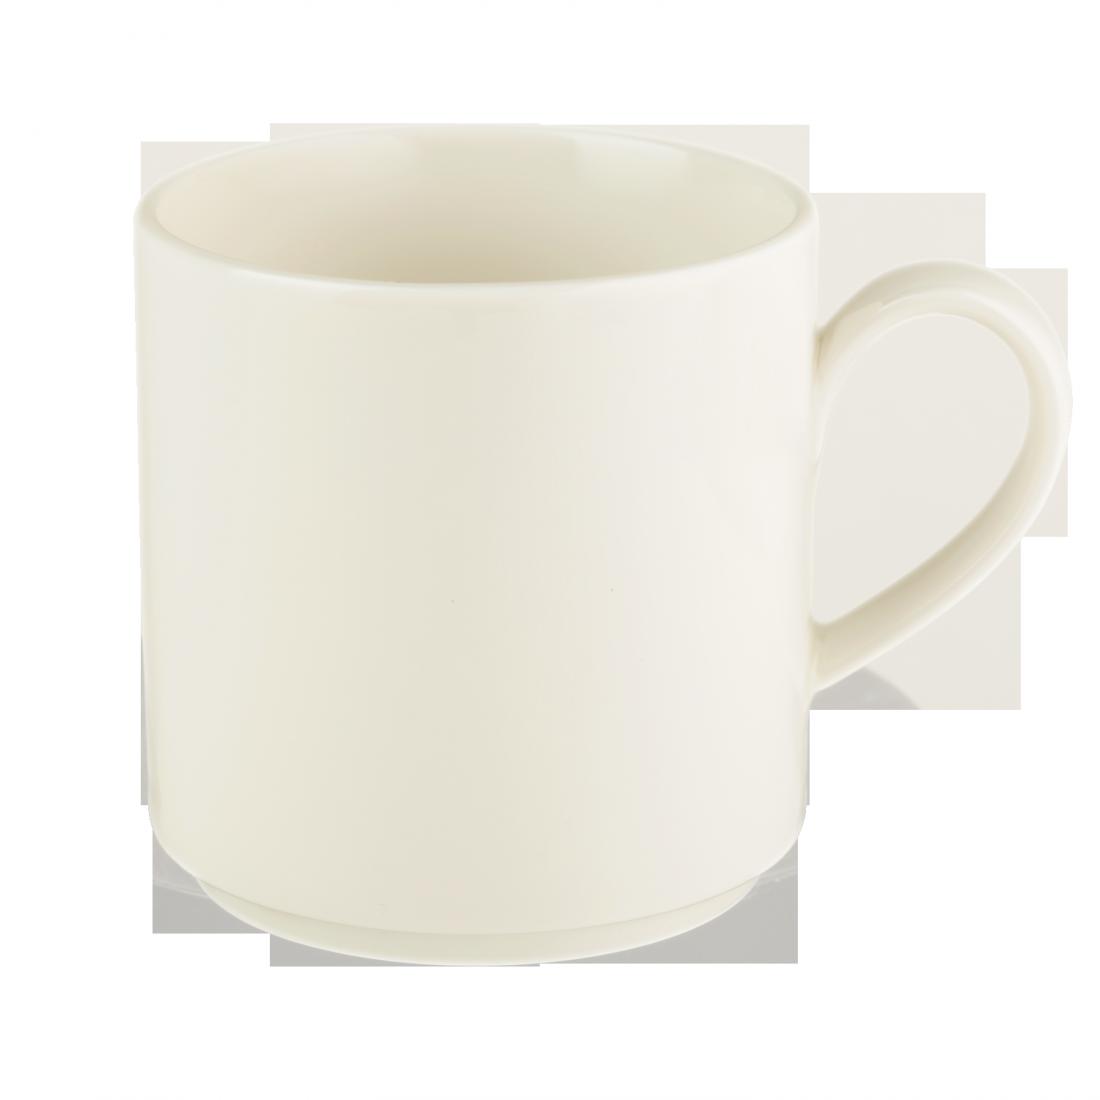 Чашка 180 мл. фарфоровая, белая coffee stackable Maxim, Seltmann Weiden